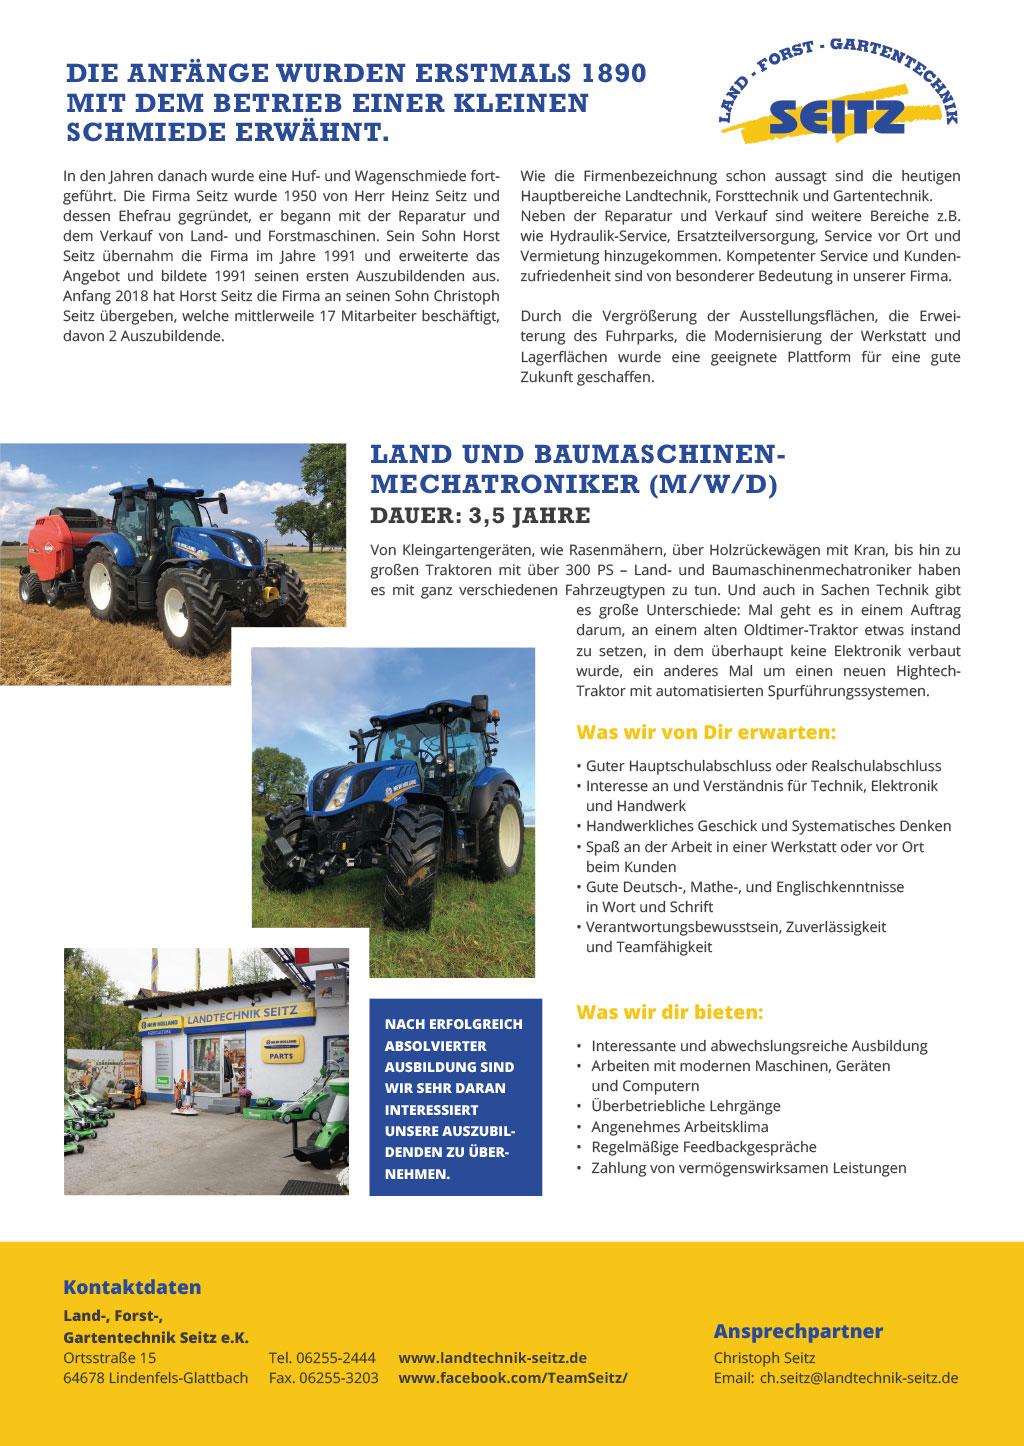 Ausbildungsplakat: Land-, Forst,- Gartentechnik Seitz e.K.